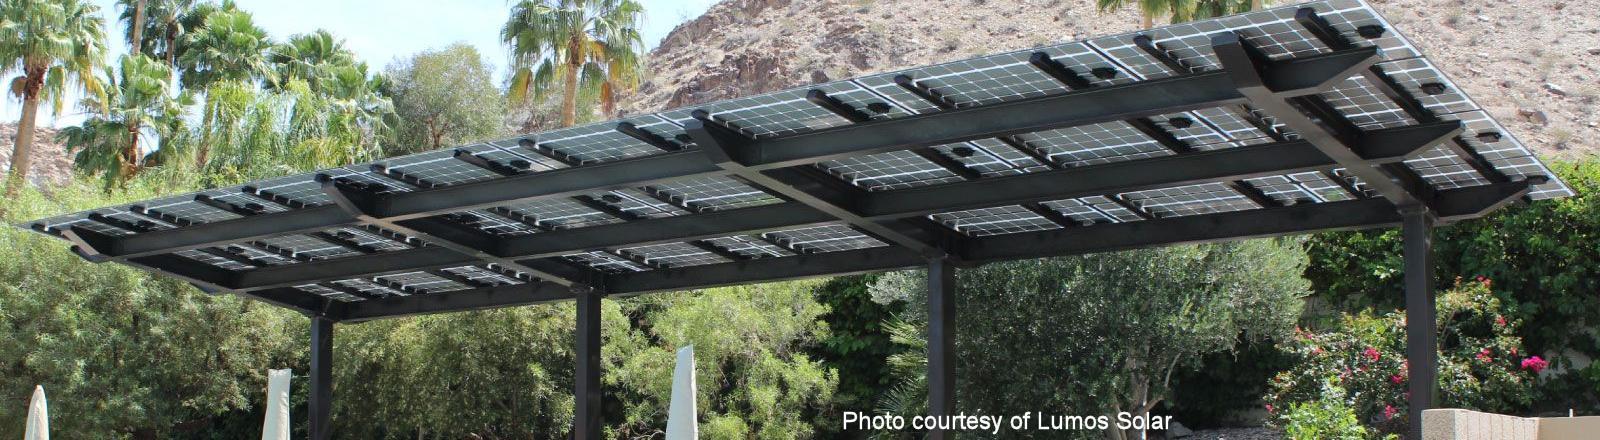 Lumos Solar Canopy